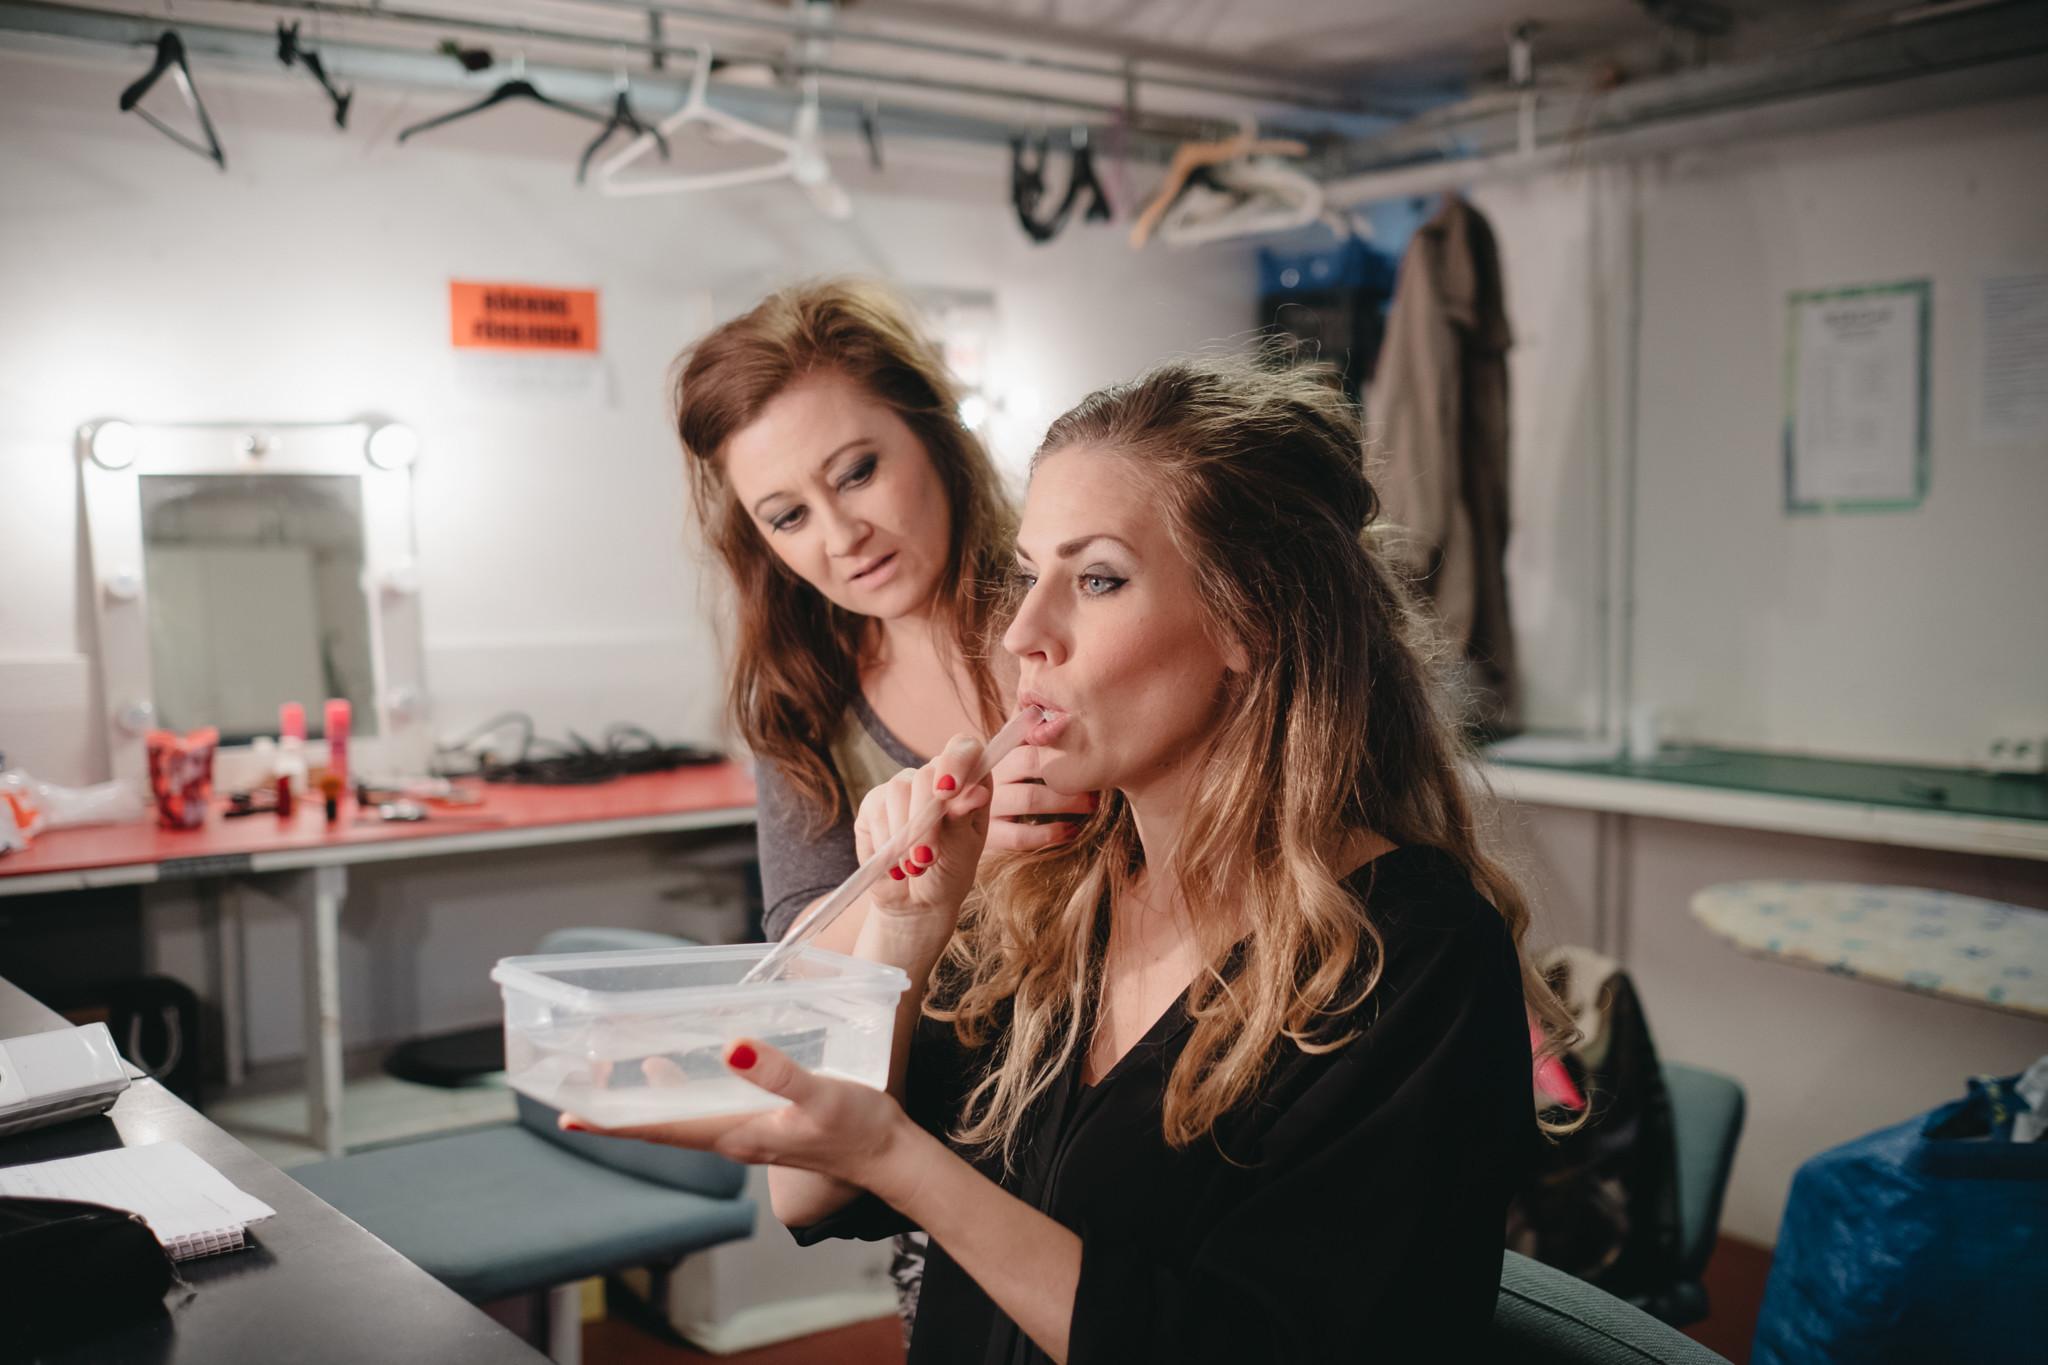 Maria coachar Linda